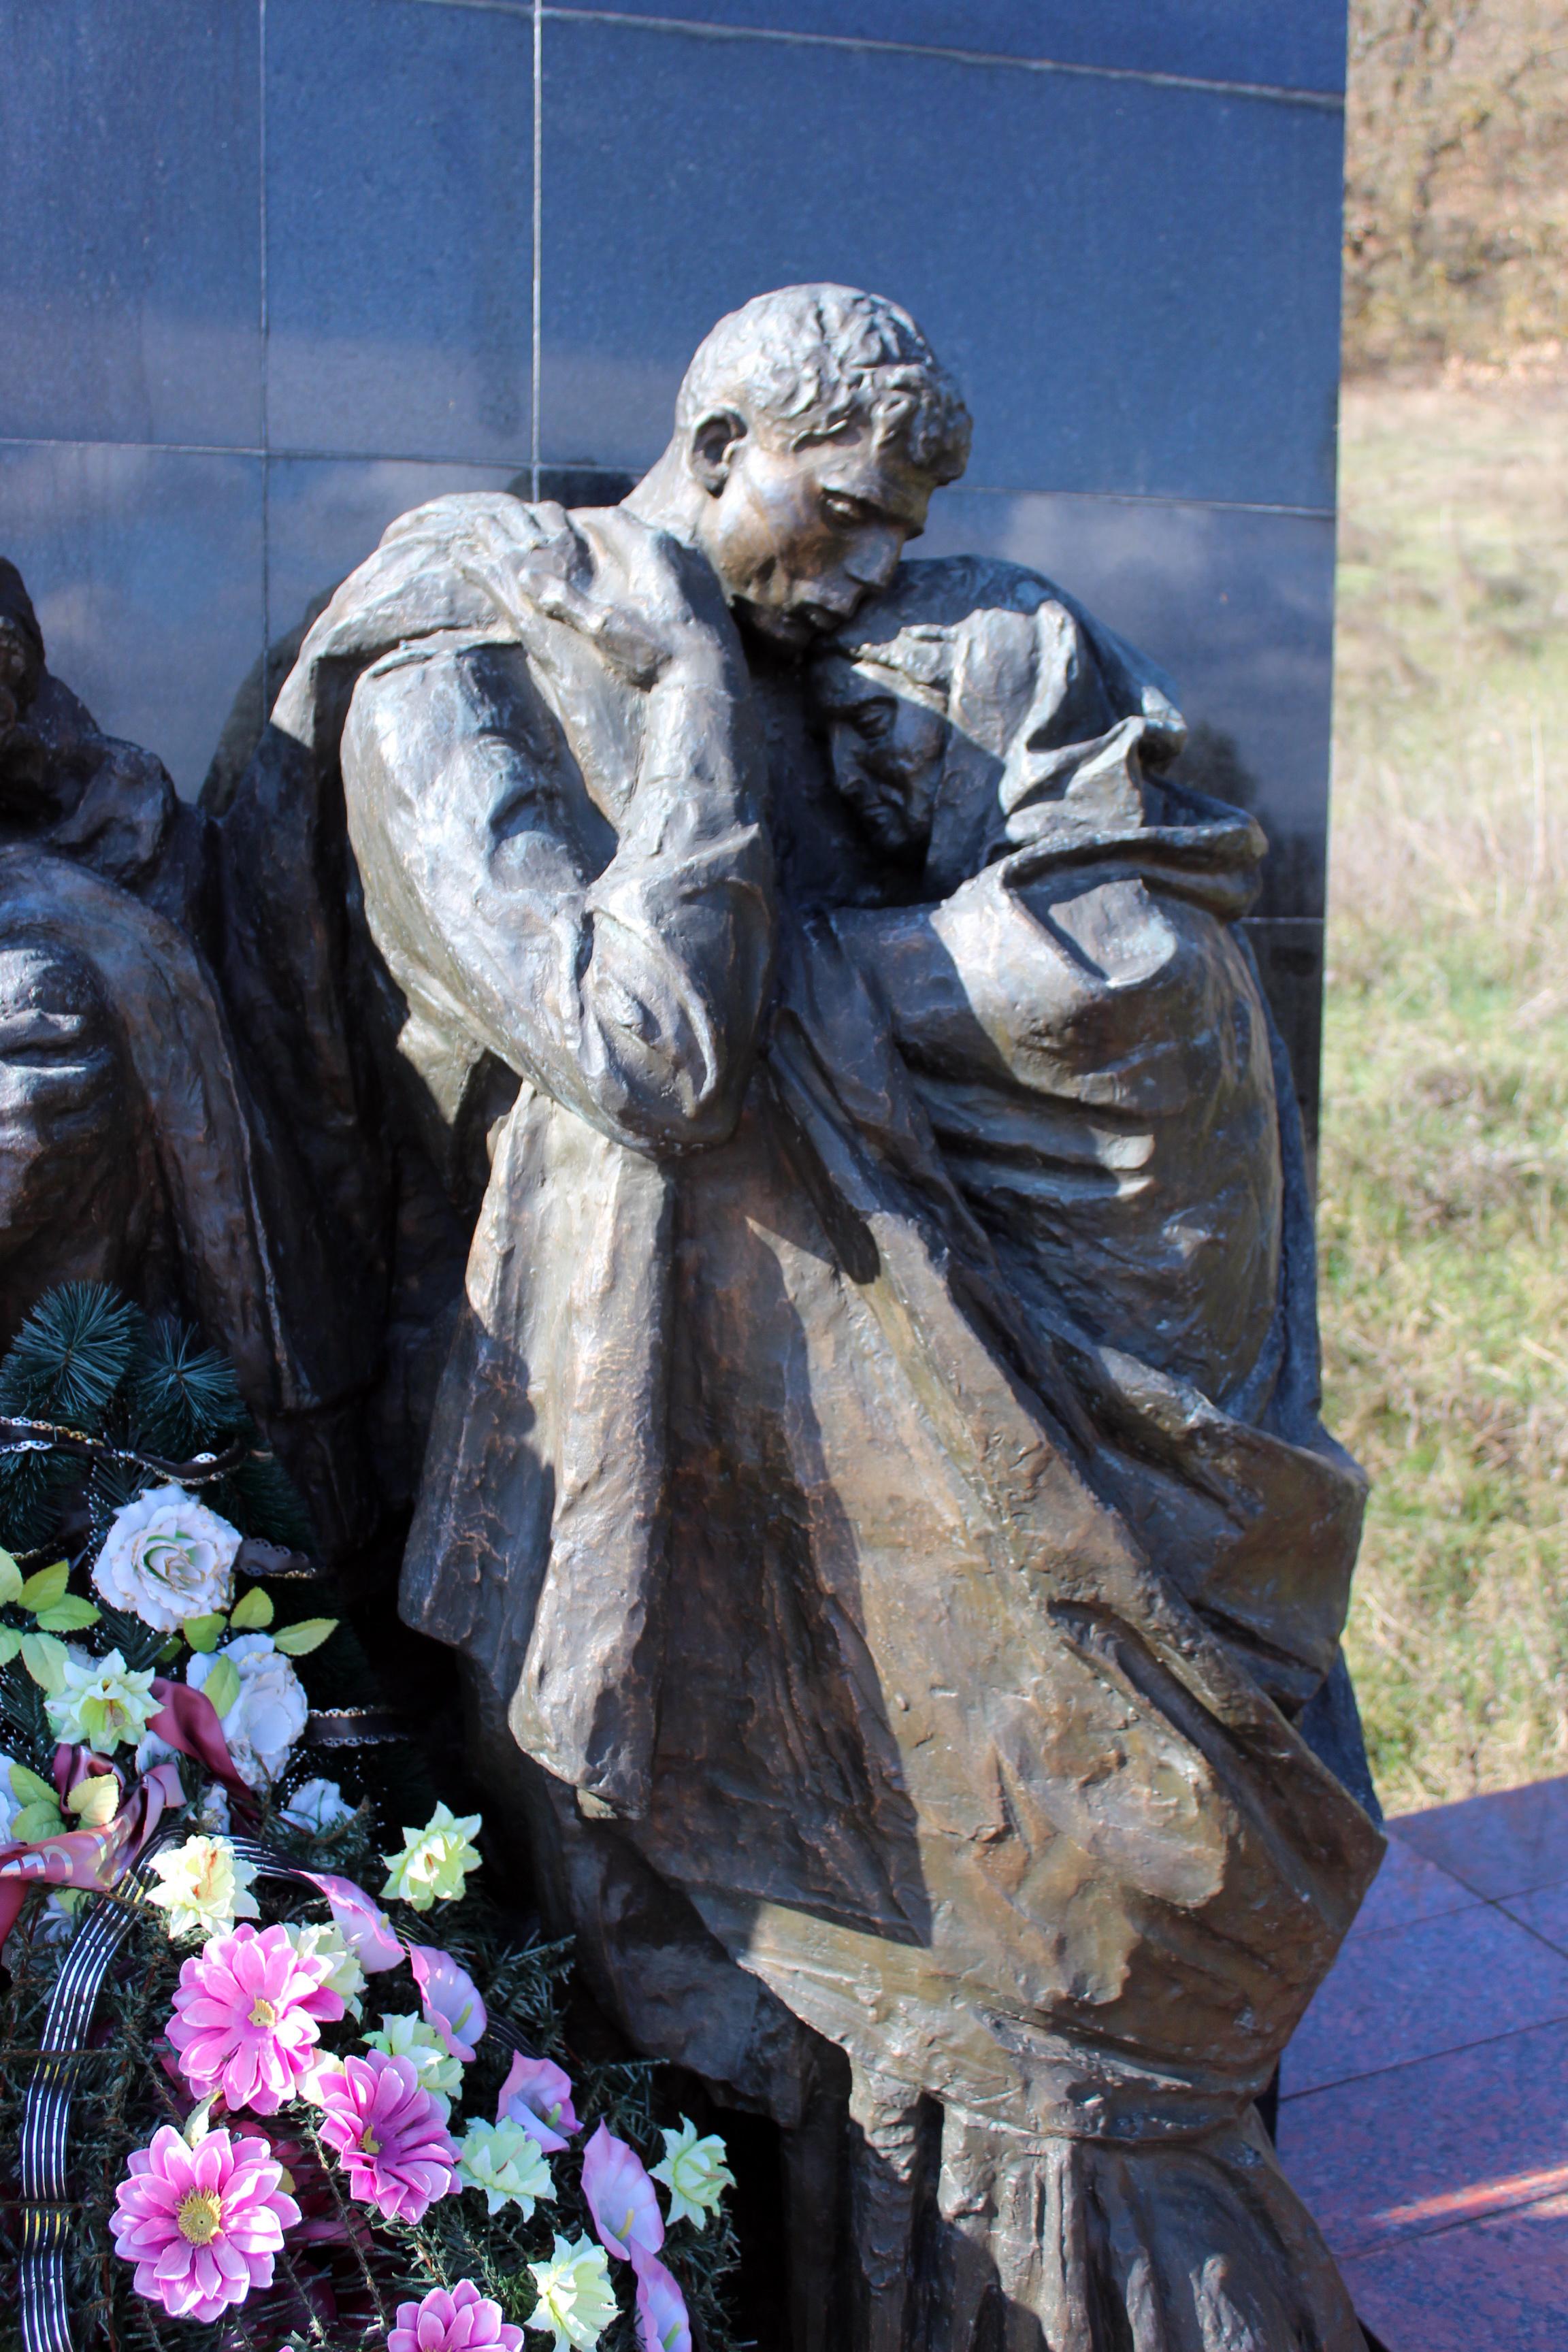 Скульптура - воин с матерью